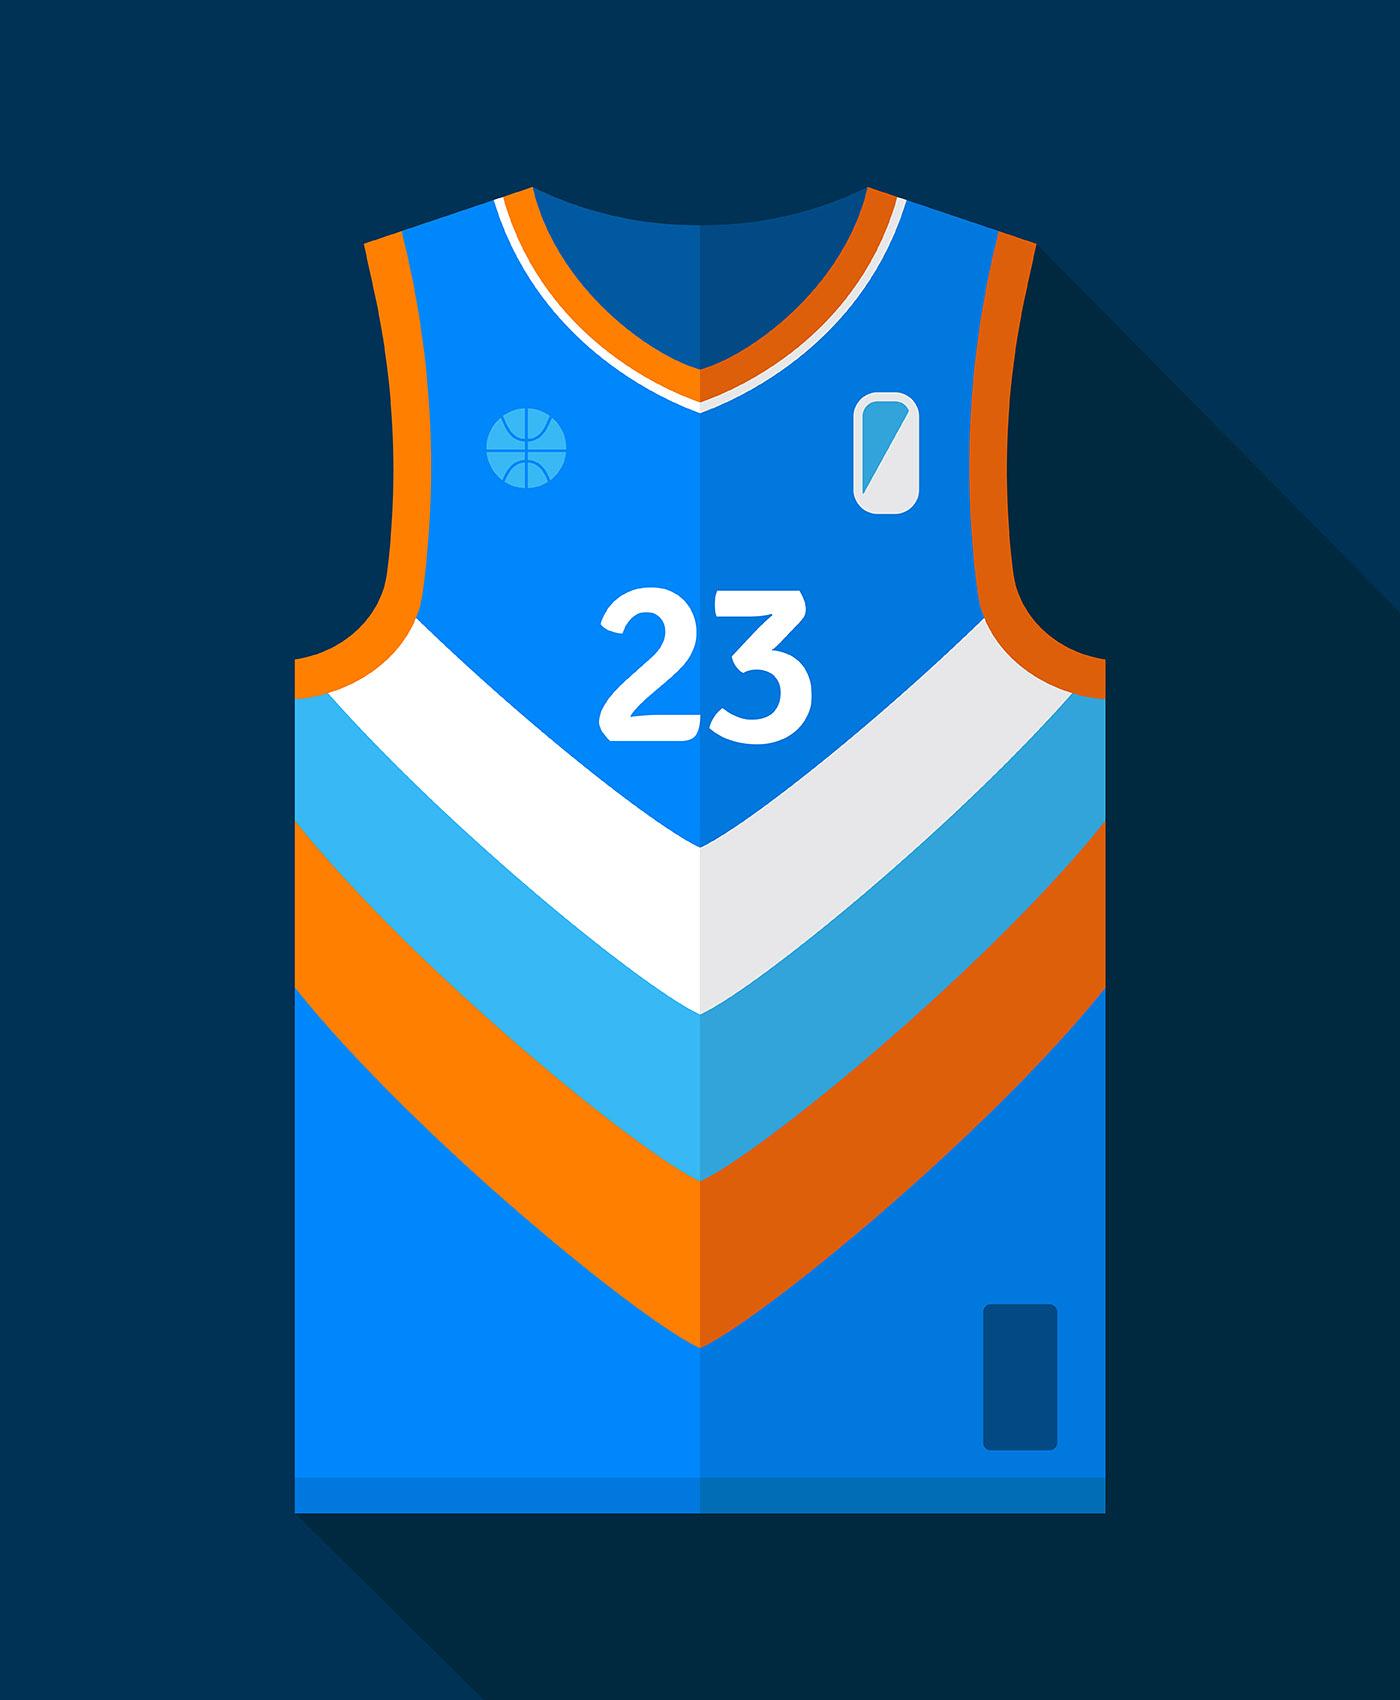 Basketball Jersey Mockup - Download Free Vectors, Clipart ...